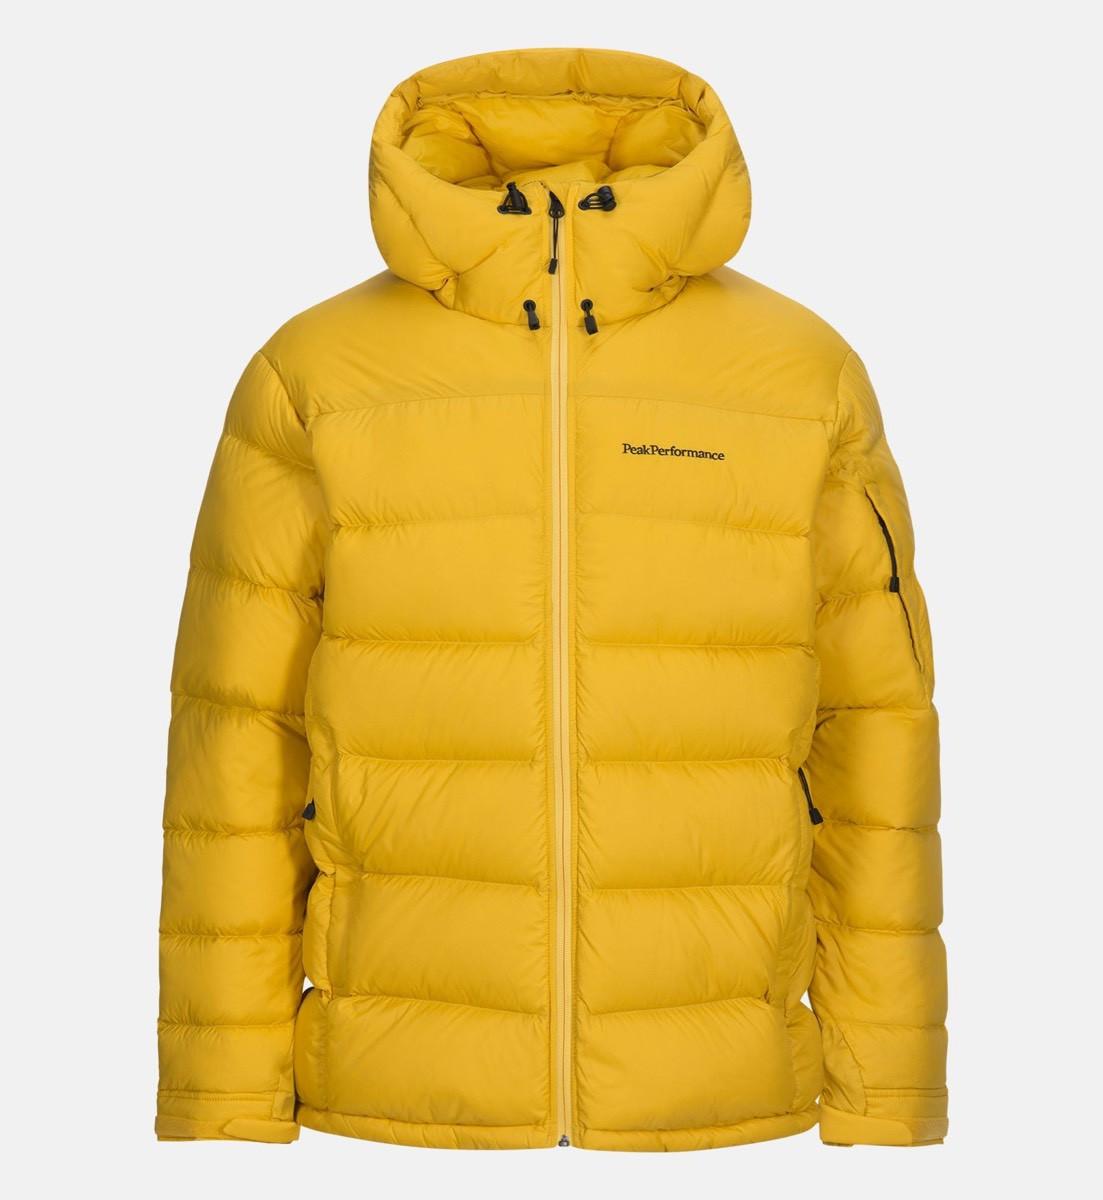 82355075007 Peak Performance Frost Down Jacket Desert Yellow Peak Performance Frost Down  Jacket Desert Yellow ...